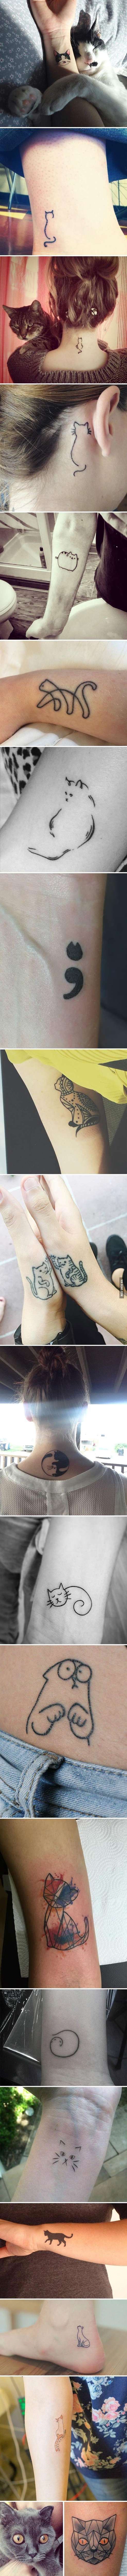 Tattoo ideas simple small  minimalistic